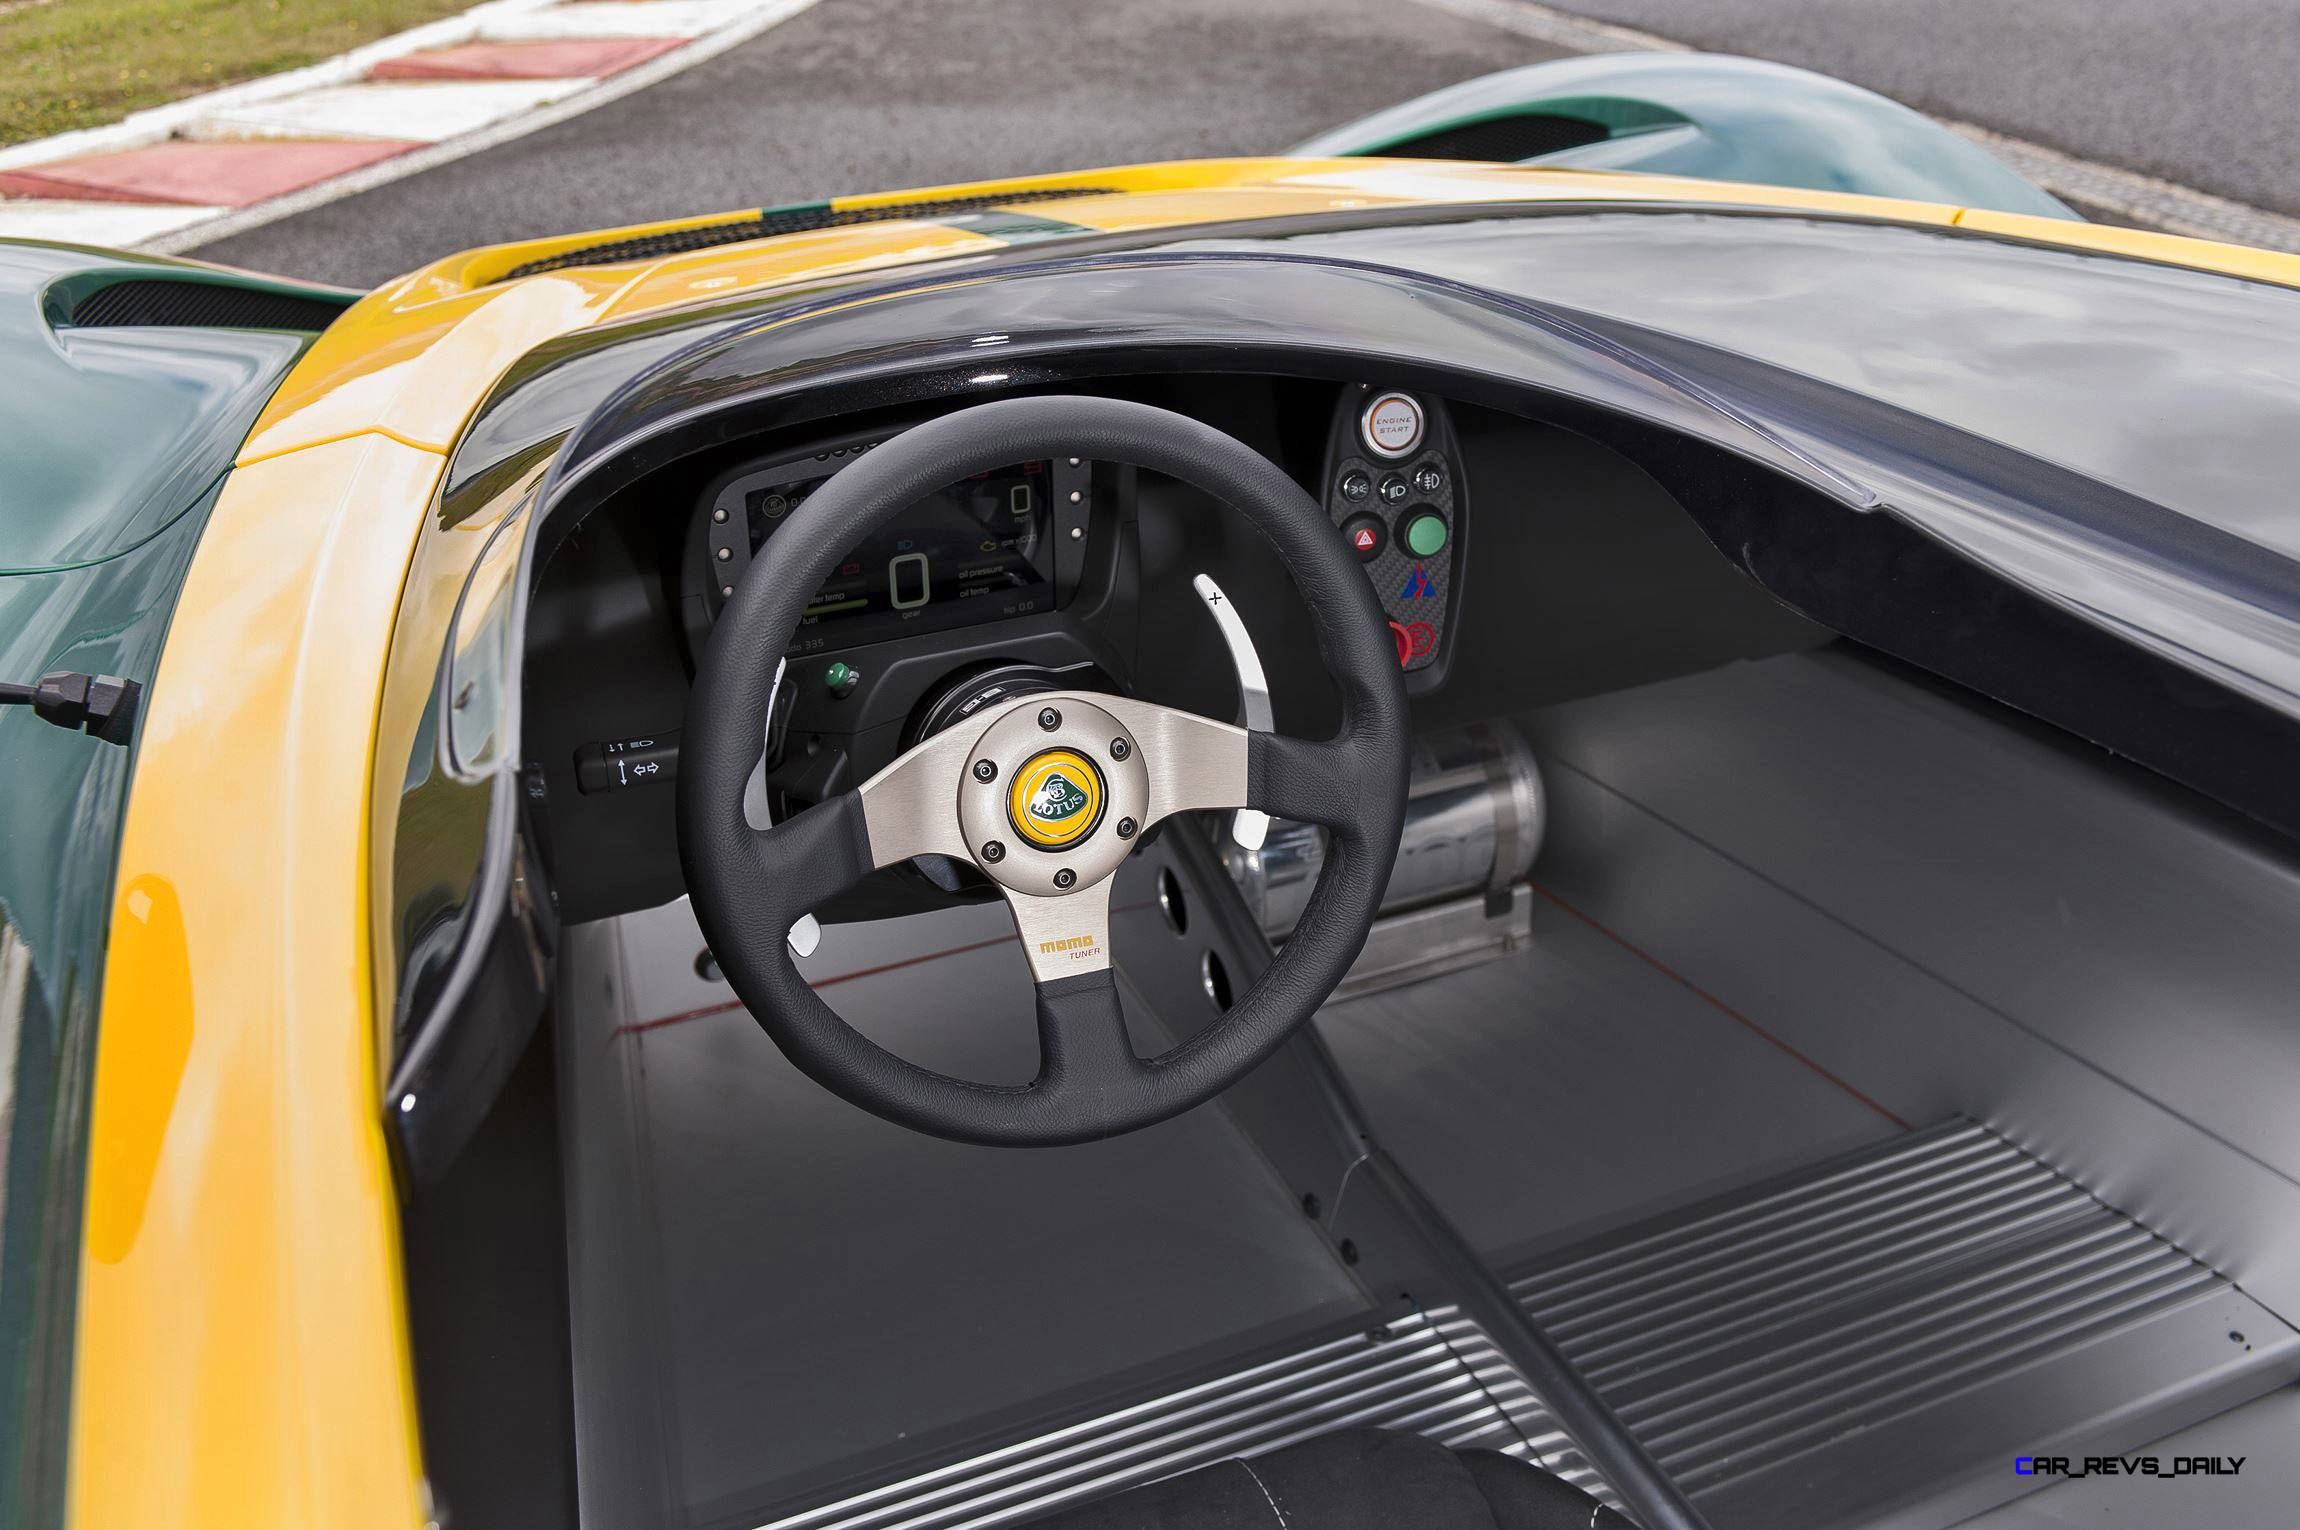 http://www.car-revs-daily.com/wp-content/uploads/2015/06/2016-Lotus-3-Eleven-1.jpg